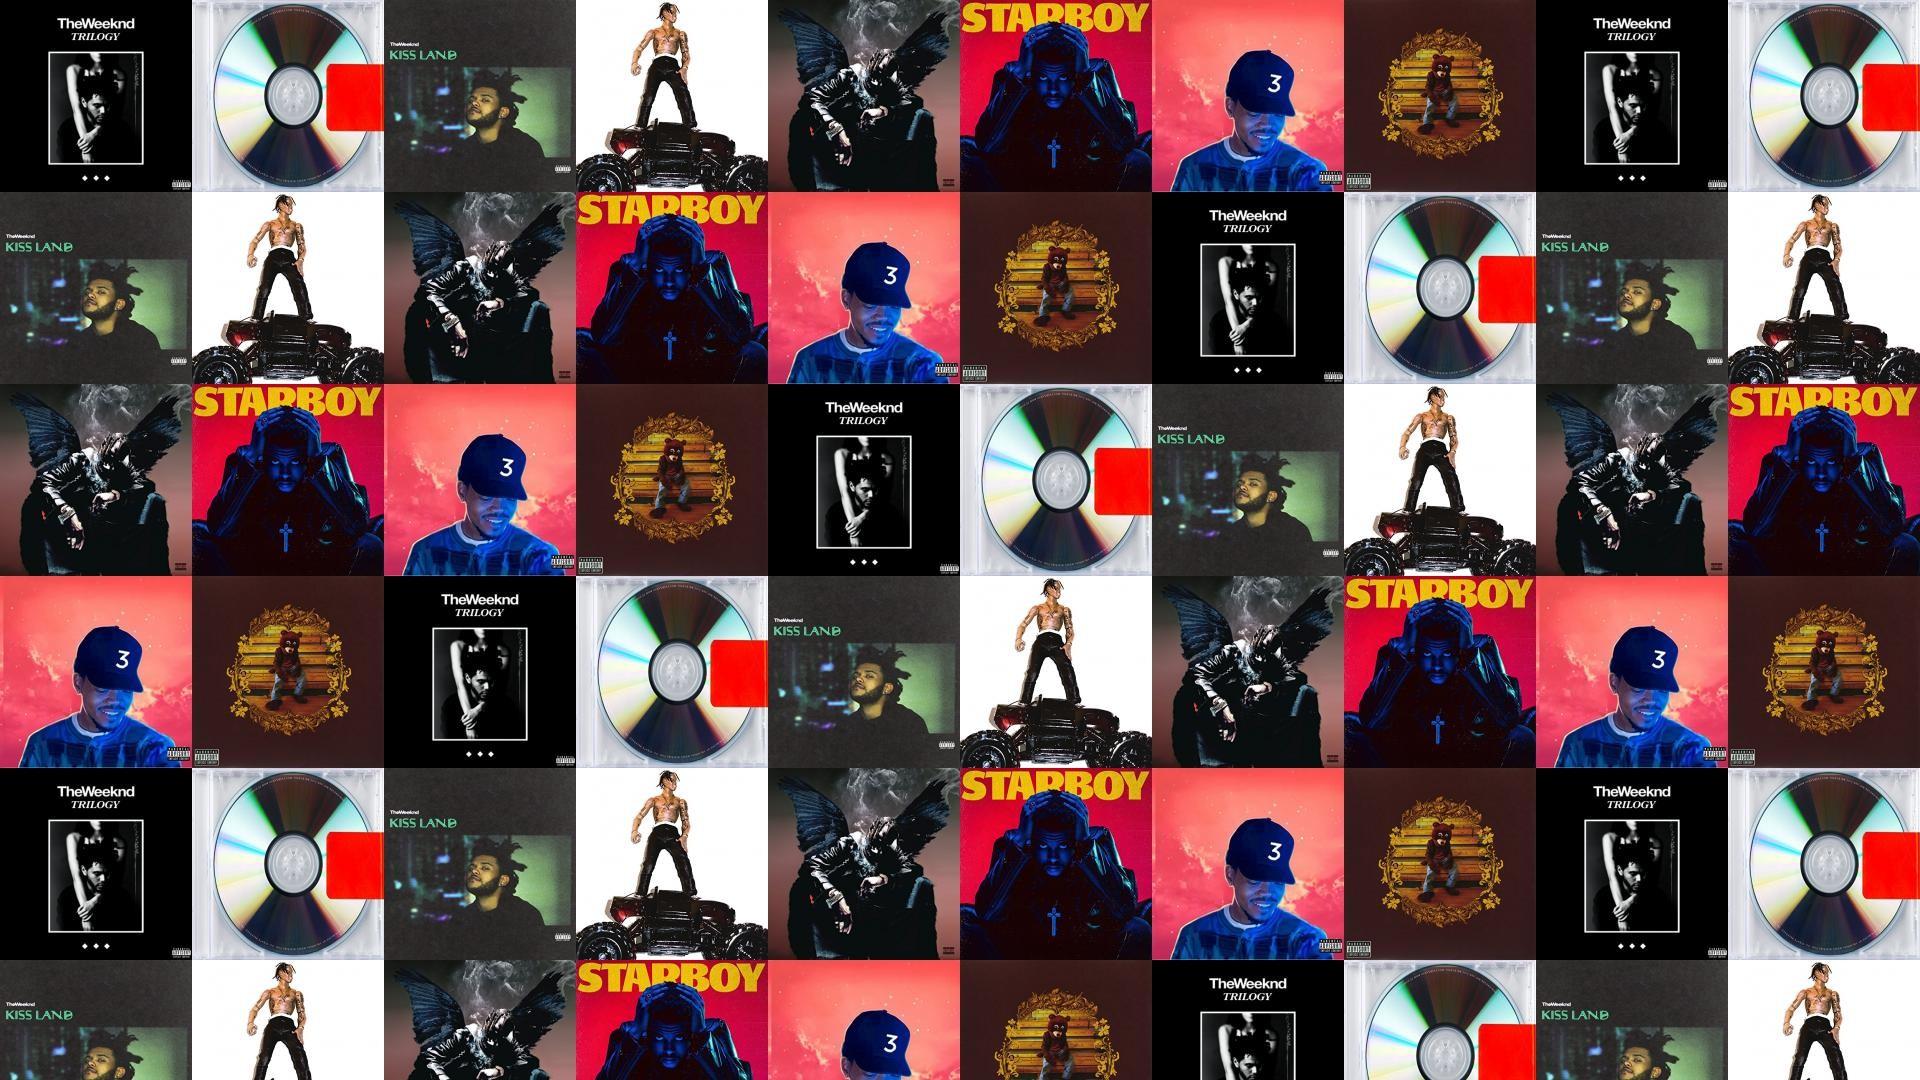 Weeknd Trilogy Kanye Yeezus Kiss Land Travis Scott Wallpaper Â« Tiled  Desktop Wallpaper